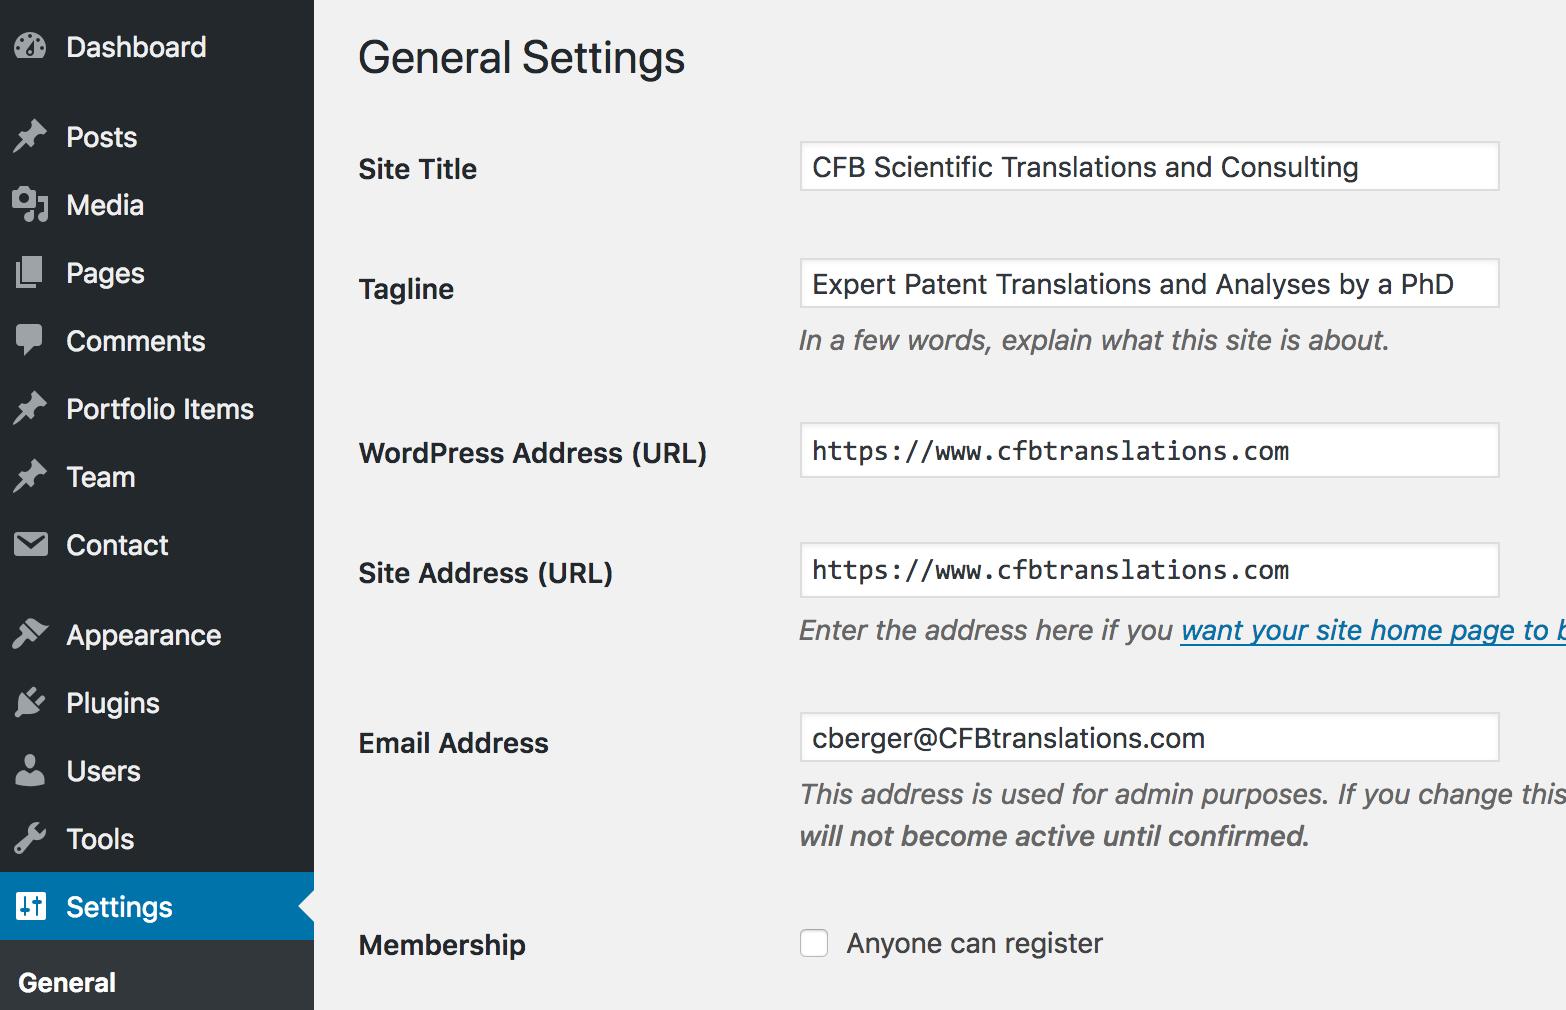 Ssl Installation On Wordpress In Preparation For The Gdpr Cfb